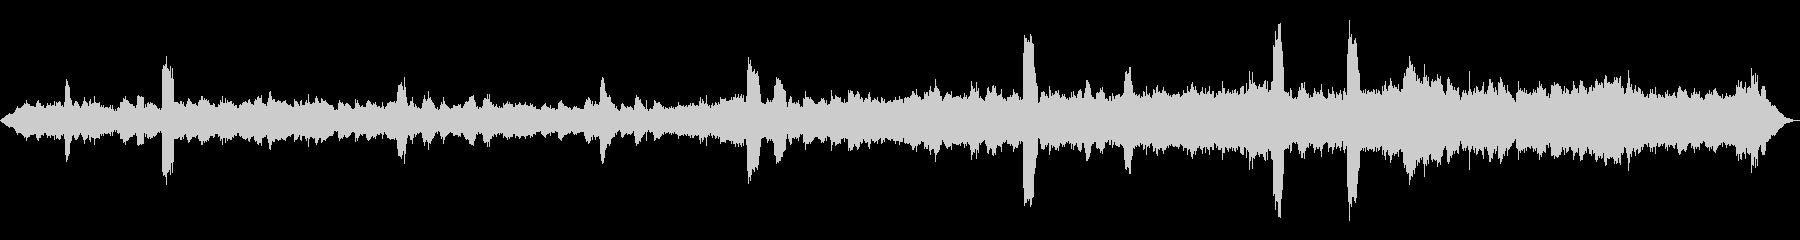 [ASMR]昆虫などが鳴いている森_01の未再生の波形